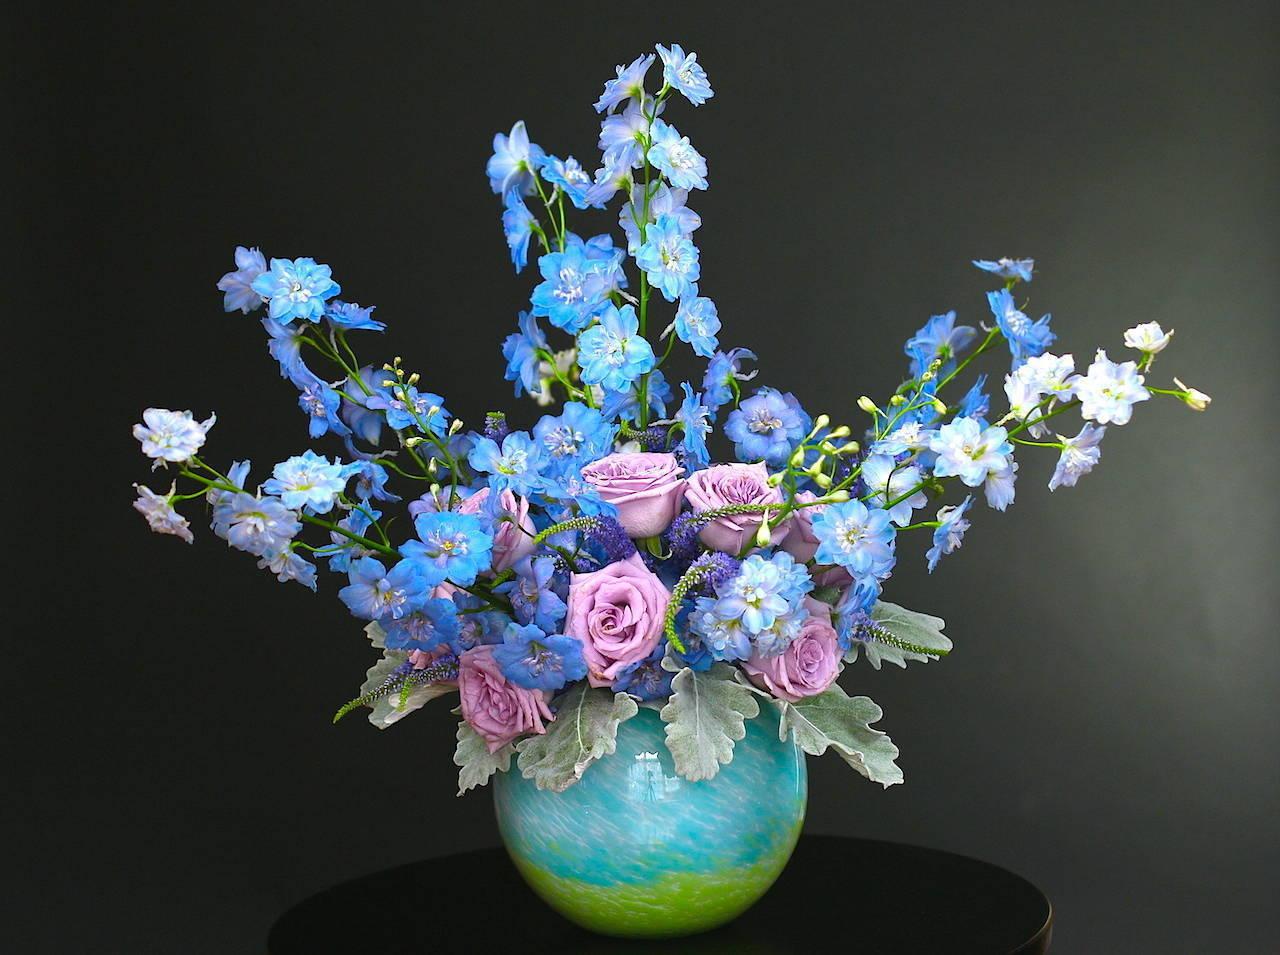 f88381e91f599d503074_43225f09fc6d90a57bf1_sahola_floral_art_event_design__new_york_.JPG